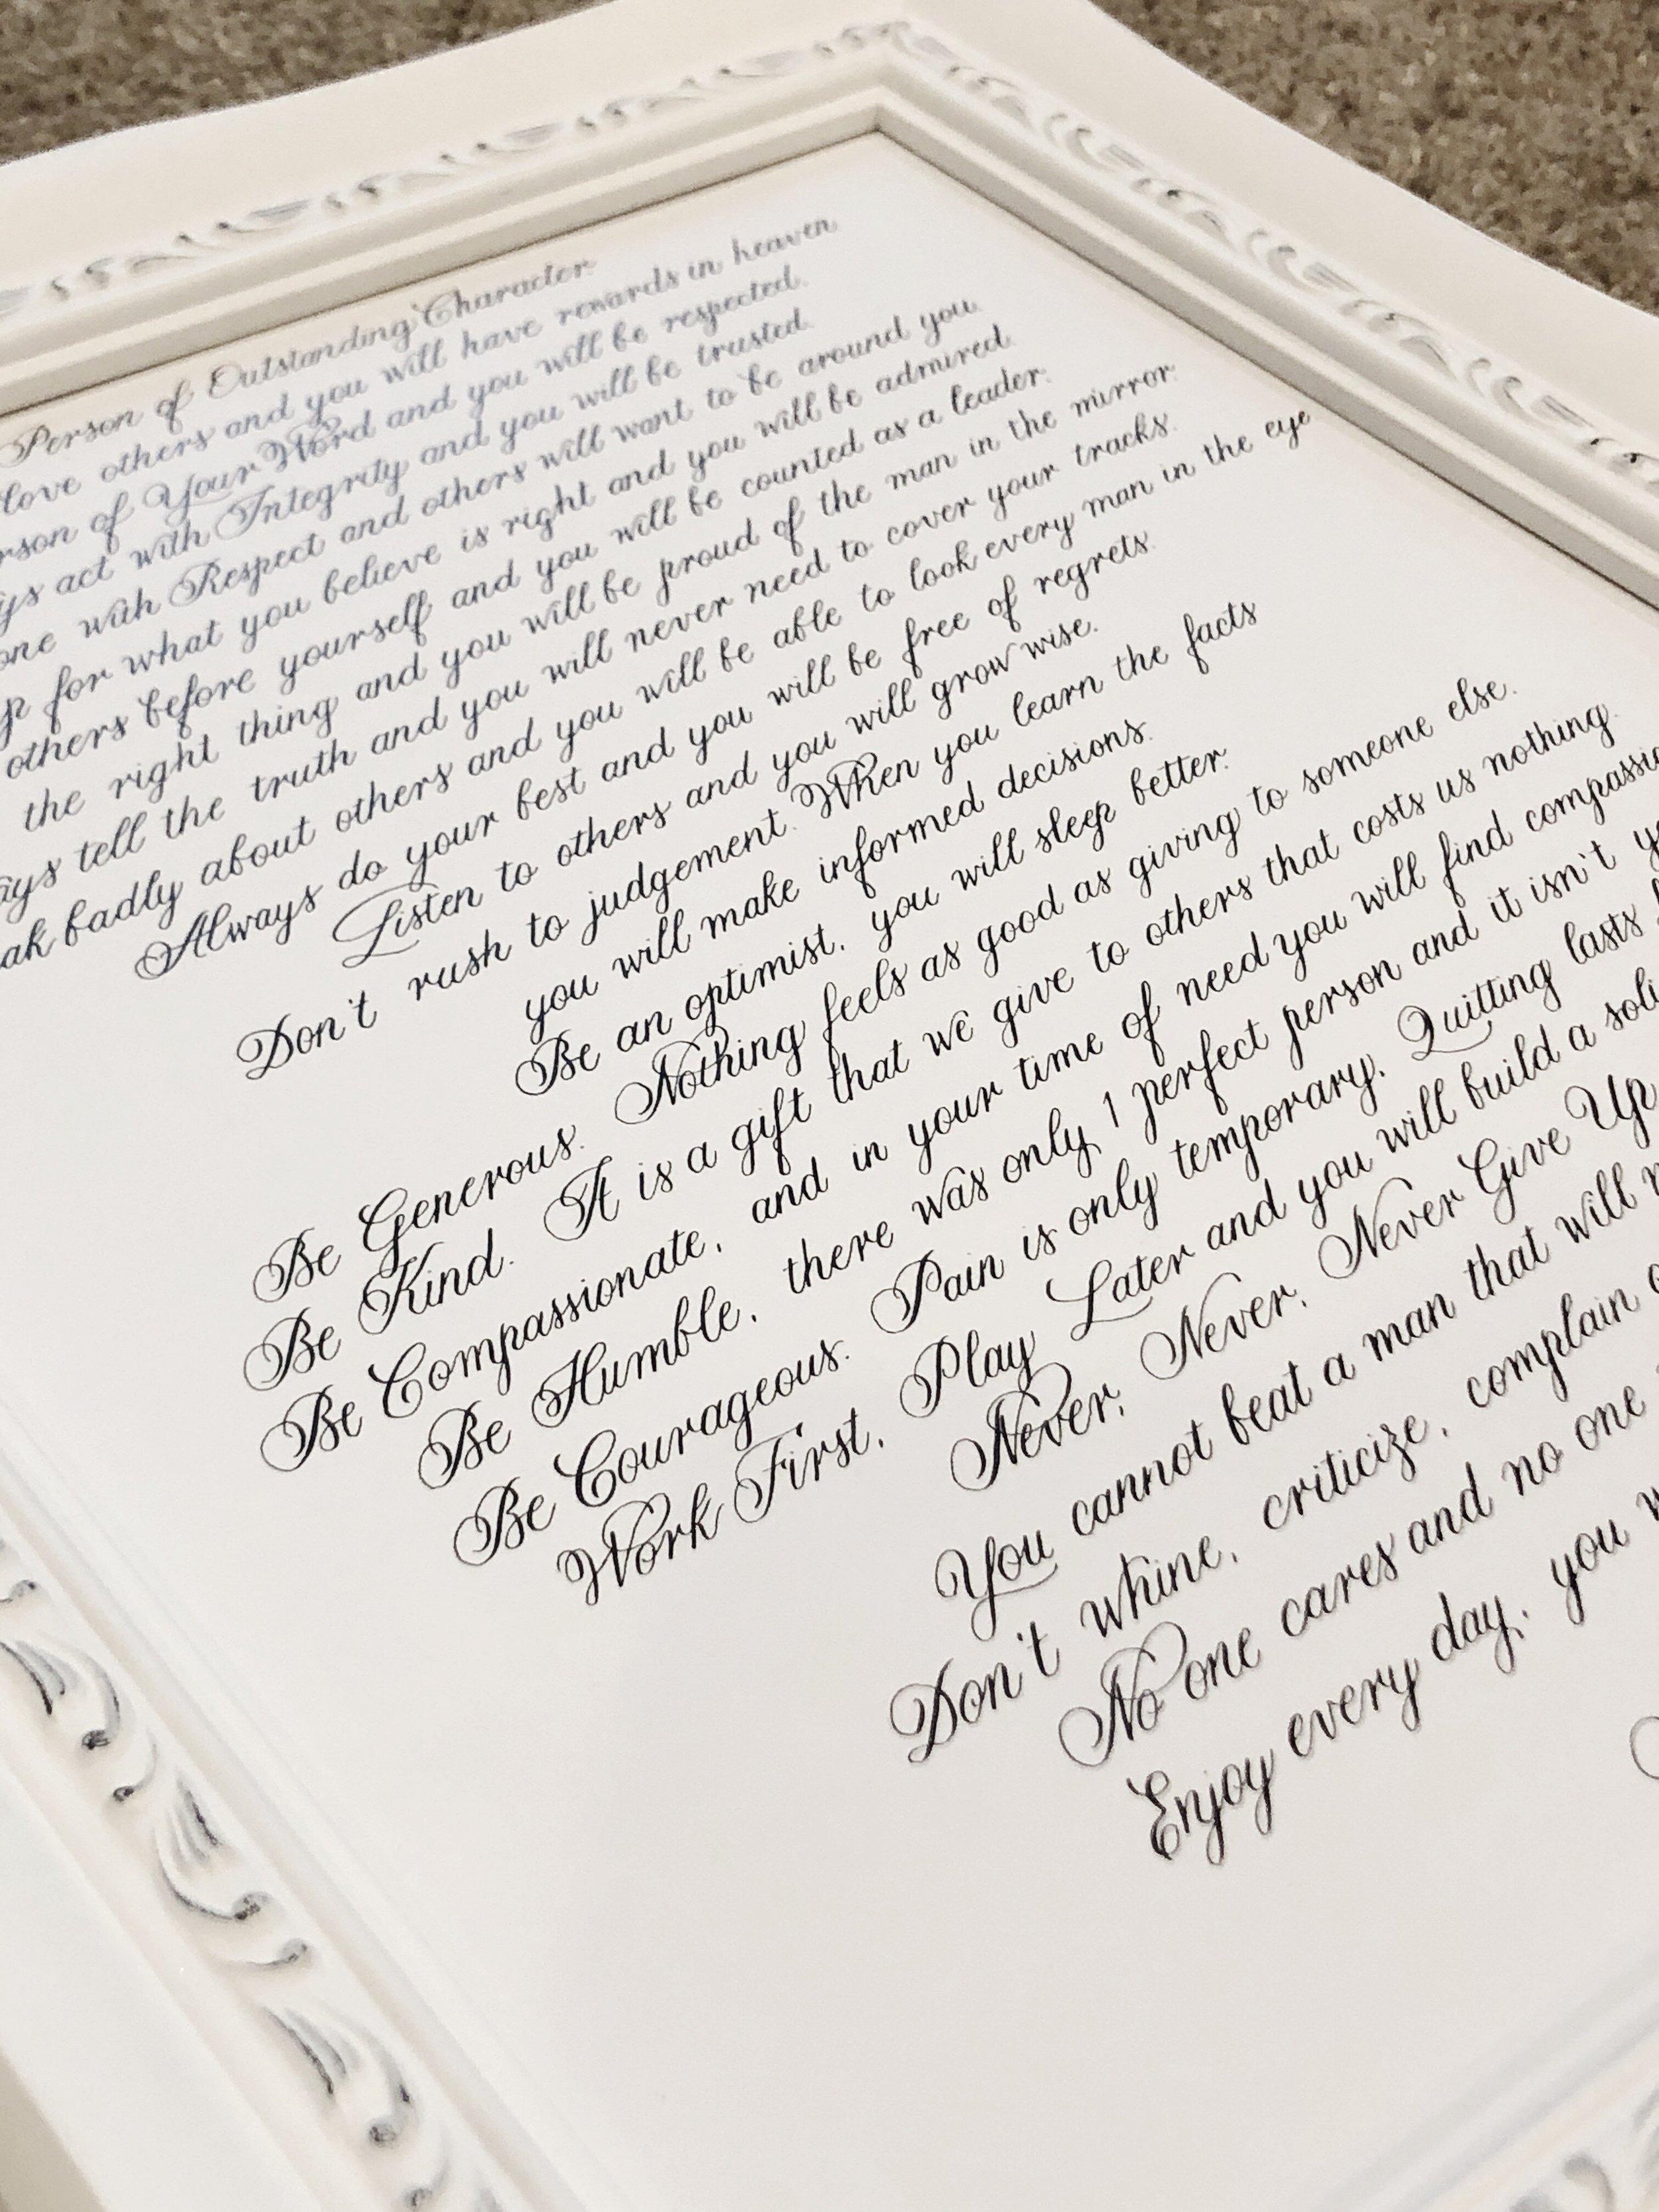 Central PA, York PA, JesSmith Designs, custom, wedding, invitations, bridal, announcements, save the date, baby, hanover, calligraphy, baltimore, wedding invitations, lancaster, gettysburg-05-16 22.14.42.jpg